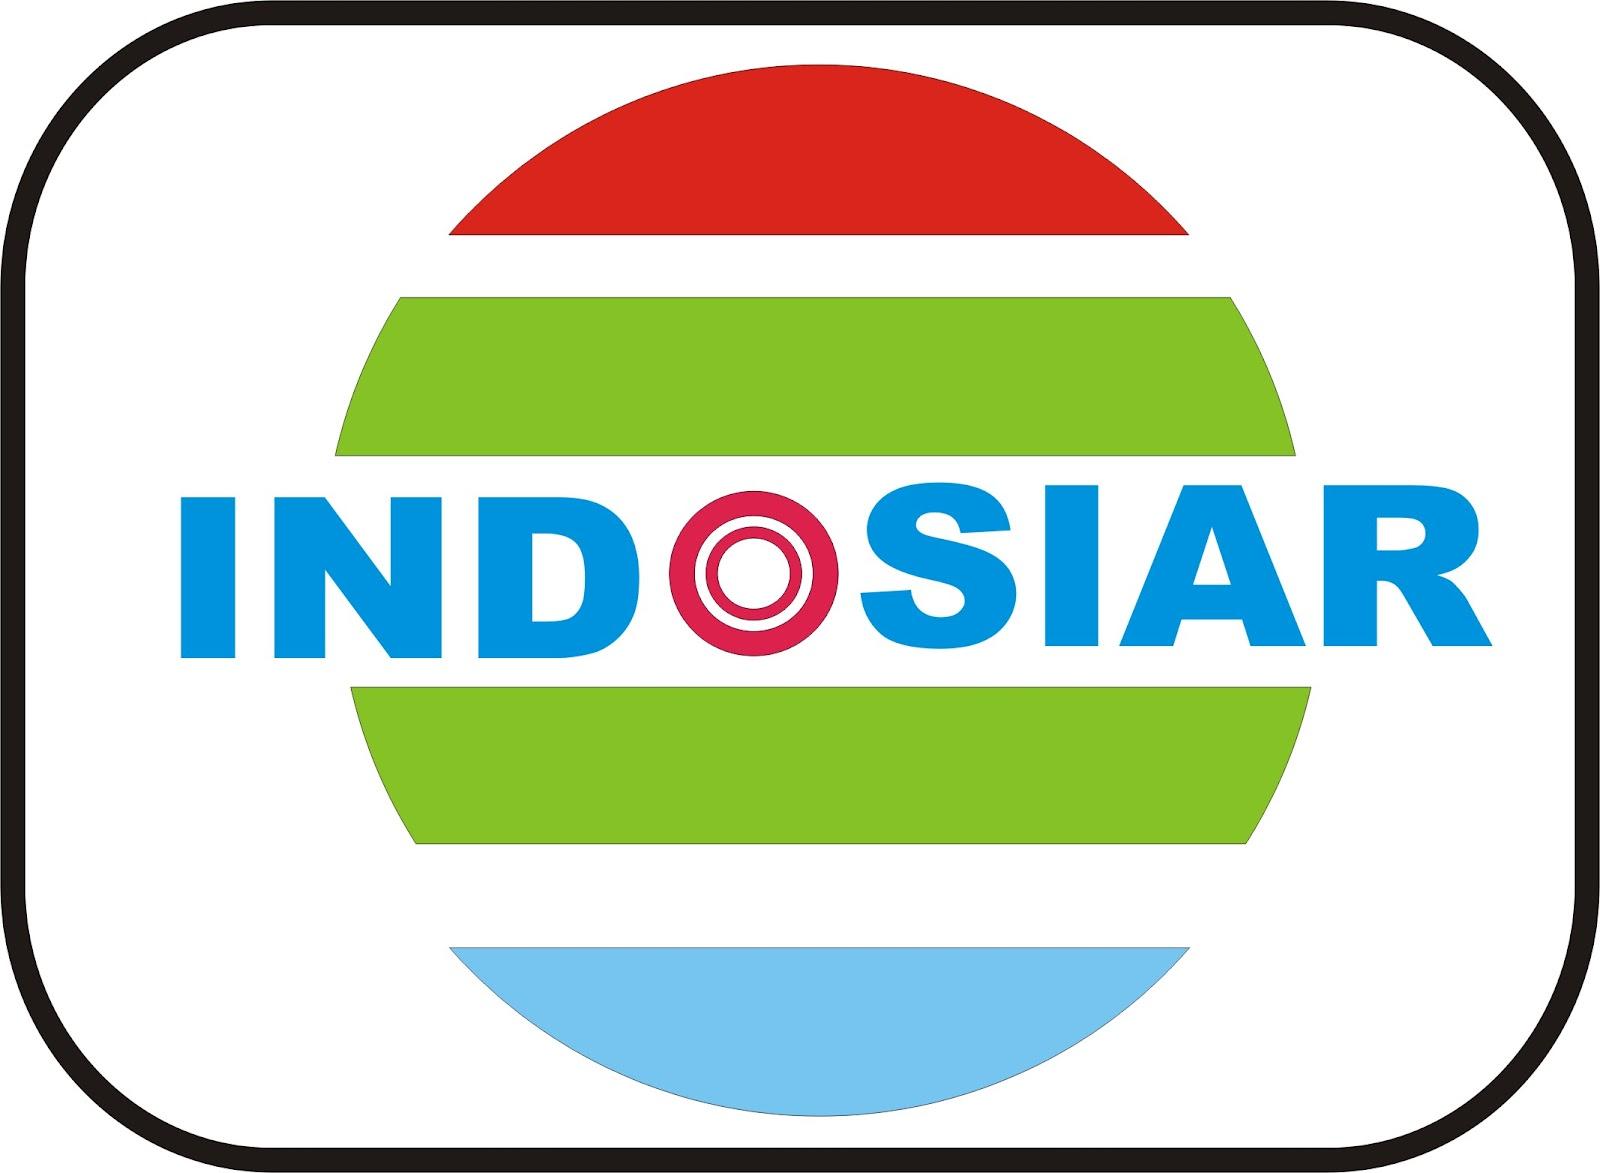 Indosiar: Streaming Indosiar